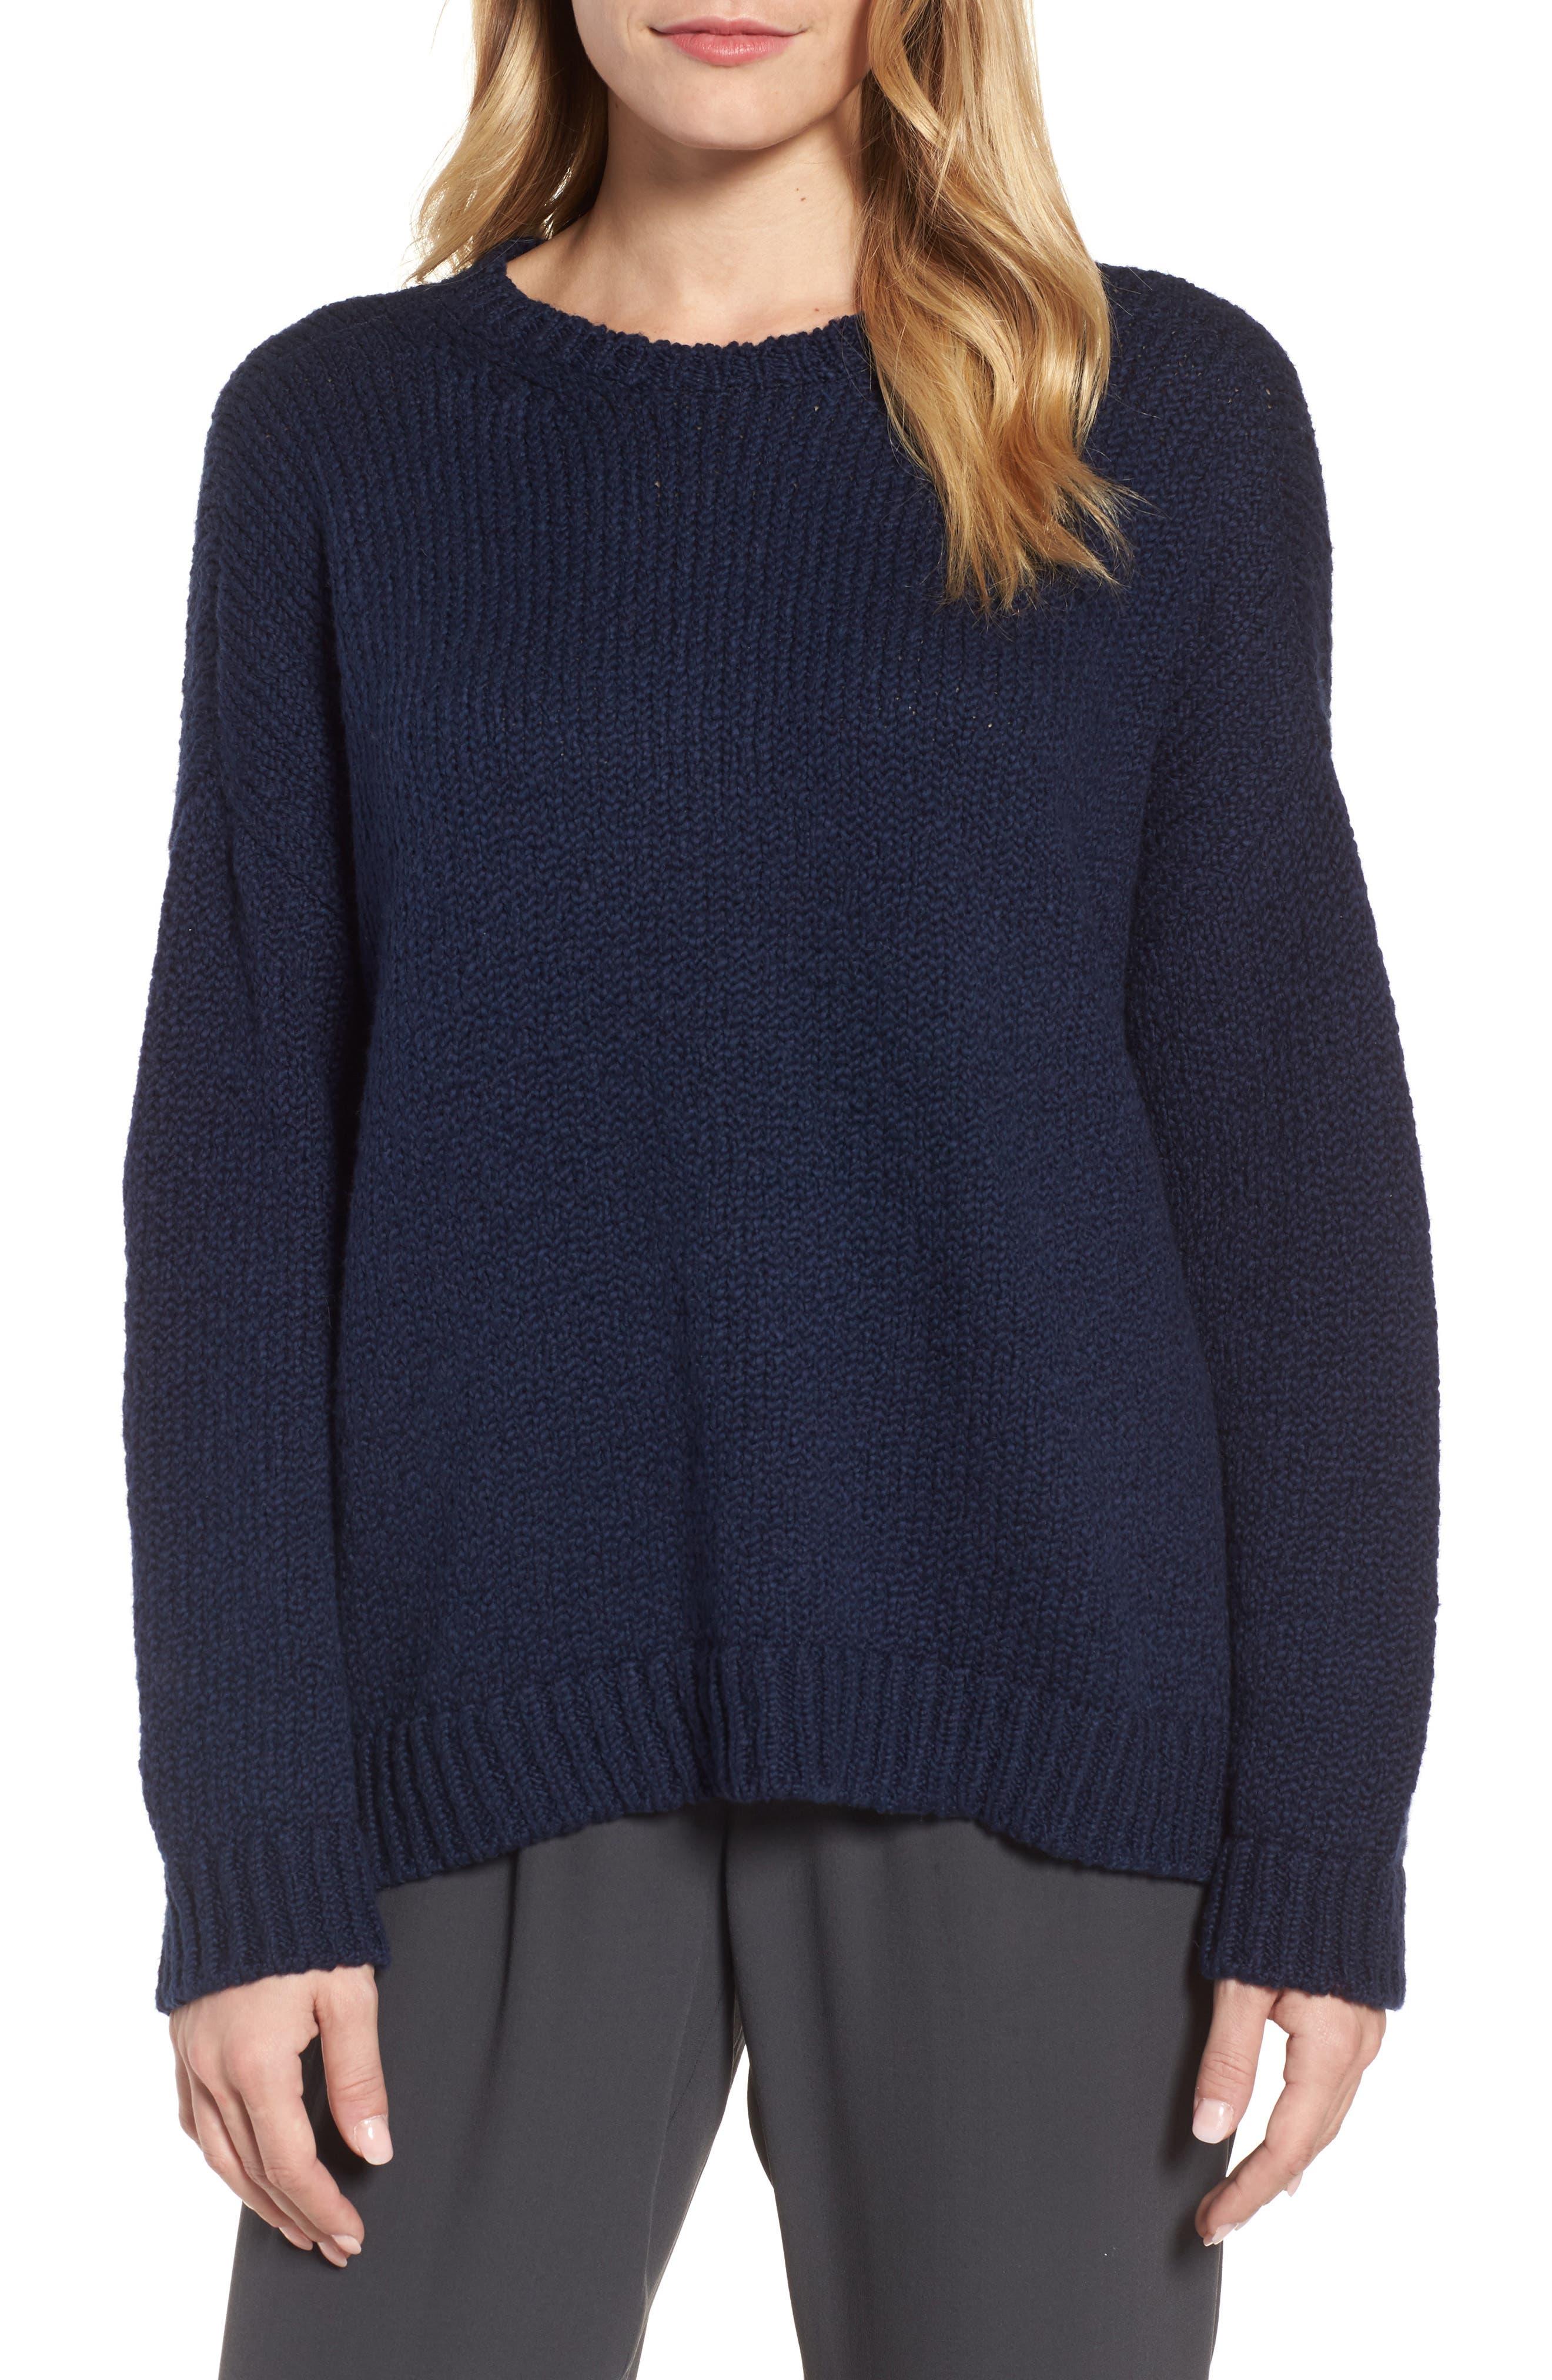 Organic Cotton Crewneck Sweater,                         Main,                         color, Midnight